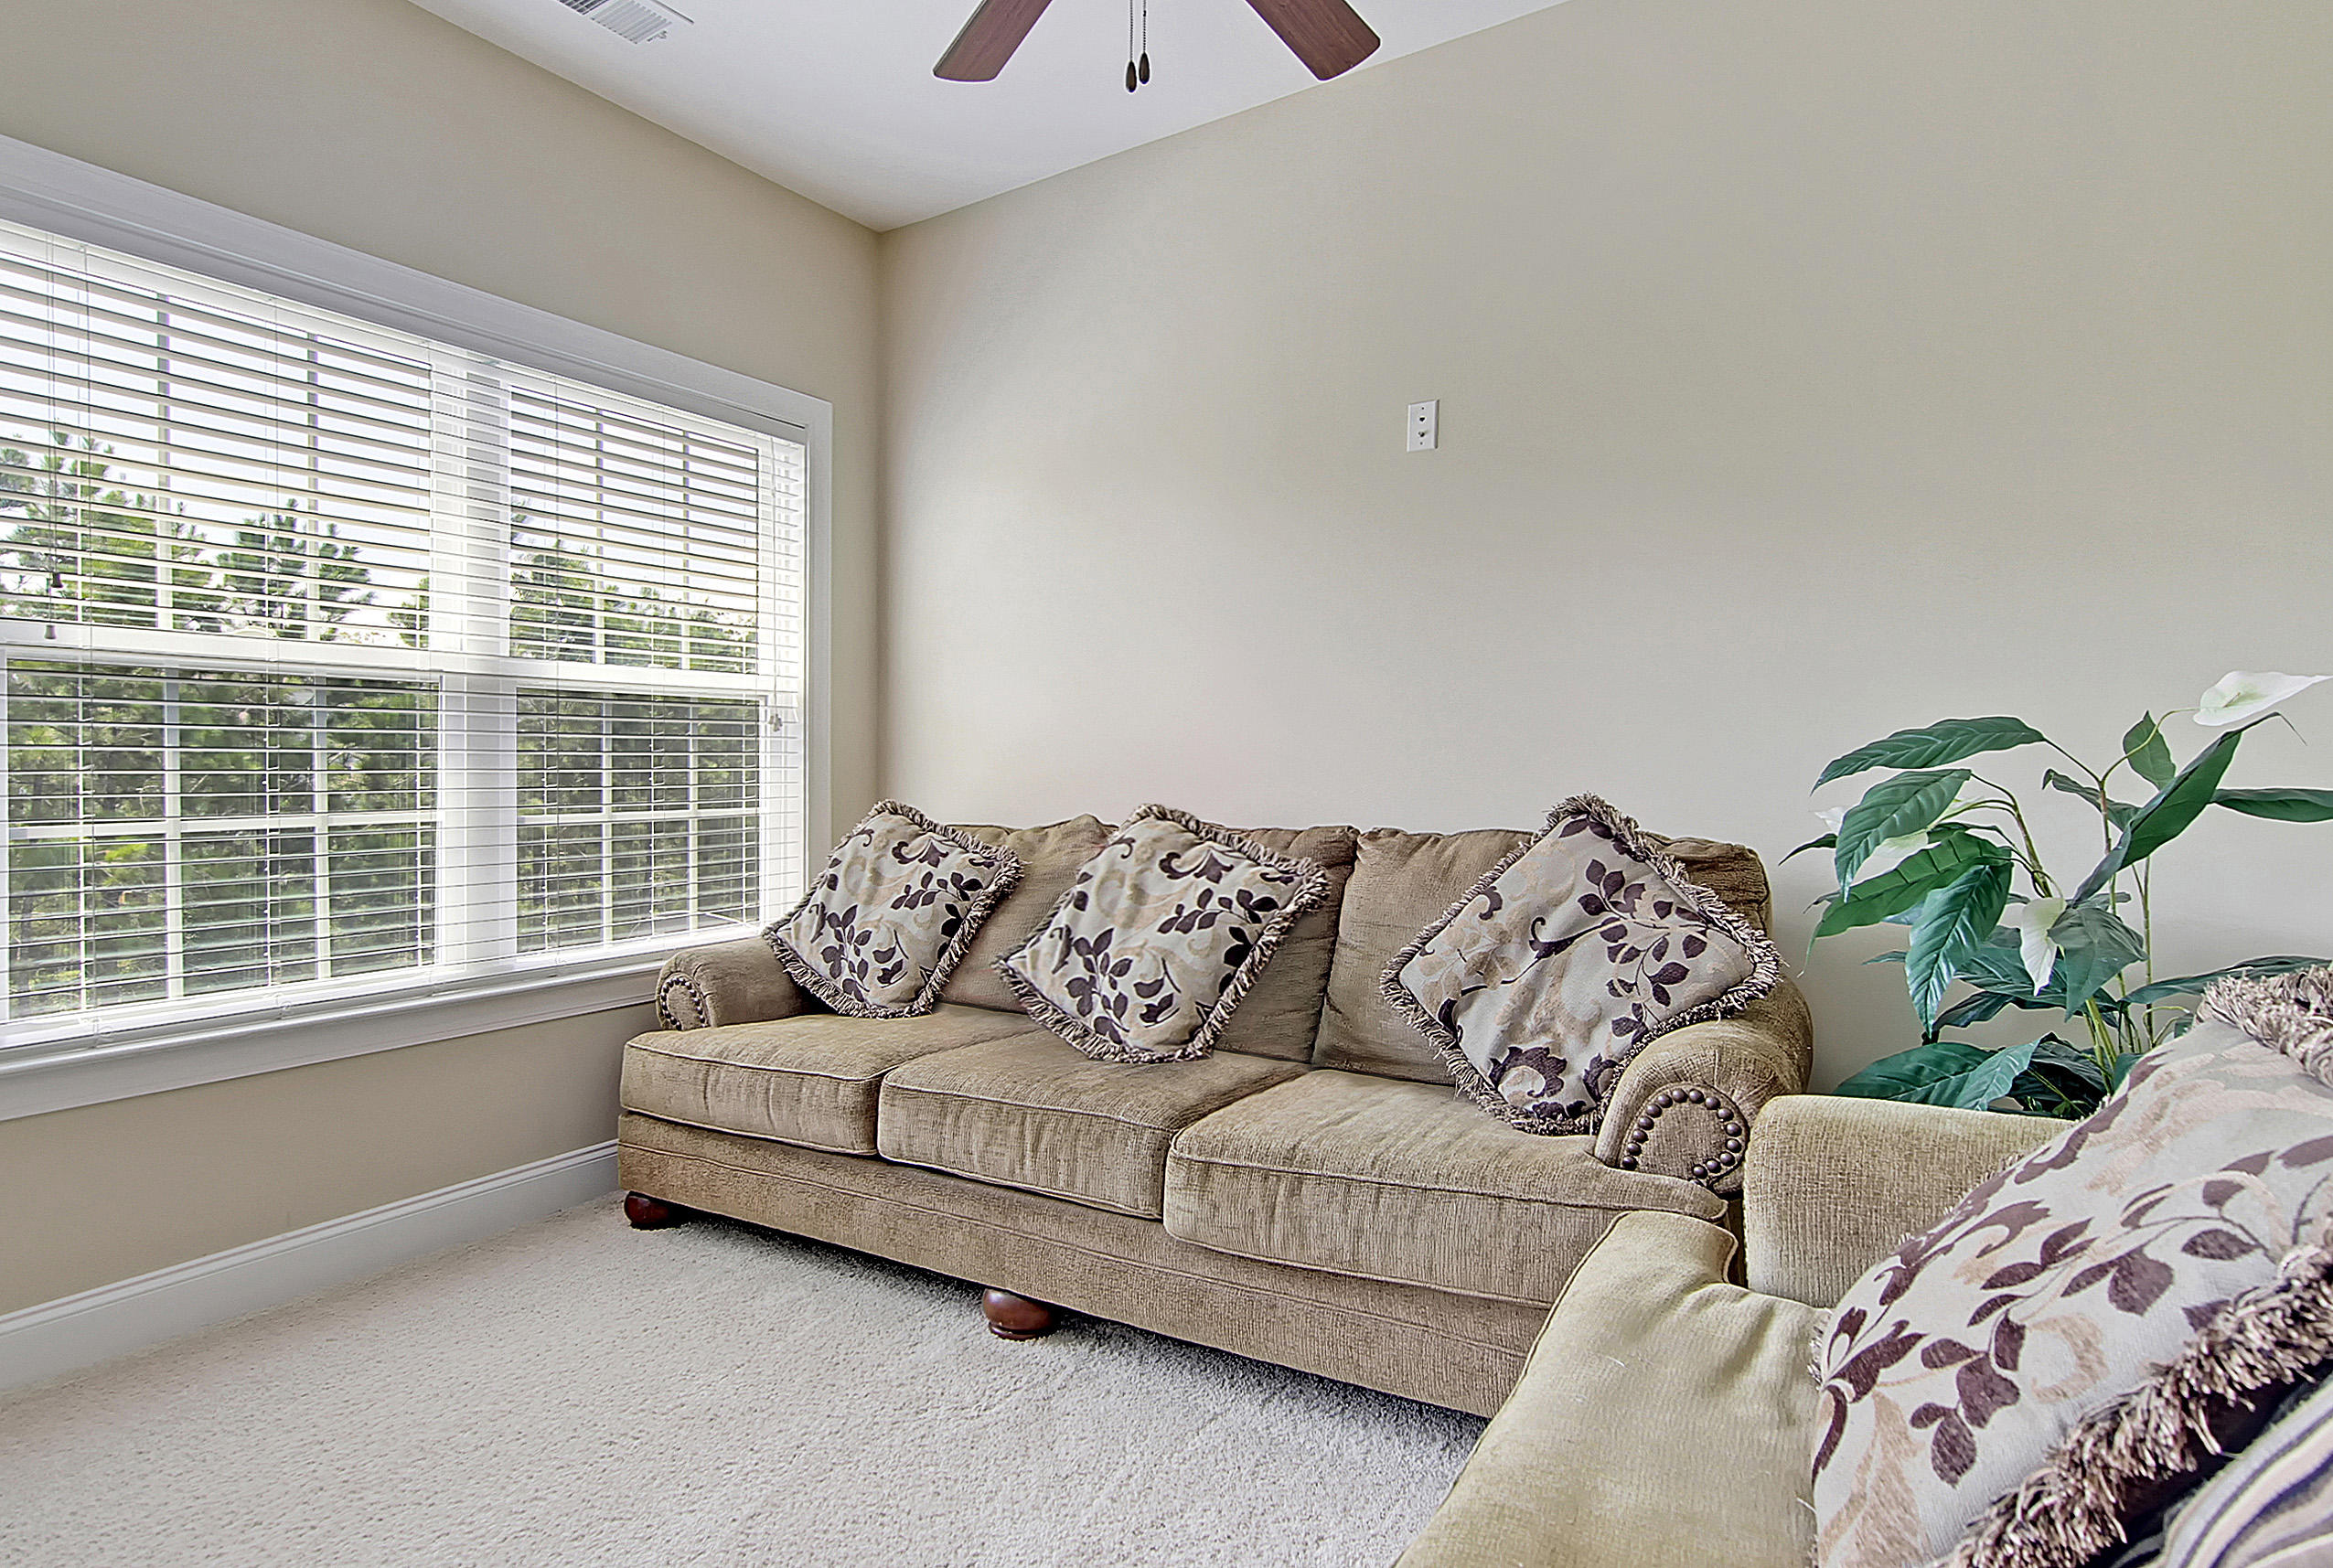 Dunes West Homes For Sale - 1332 Whisker Pole, Mount Pleasant, SC - 44